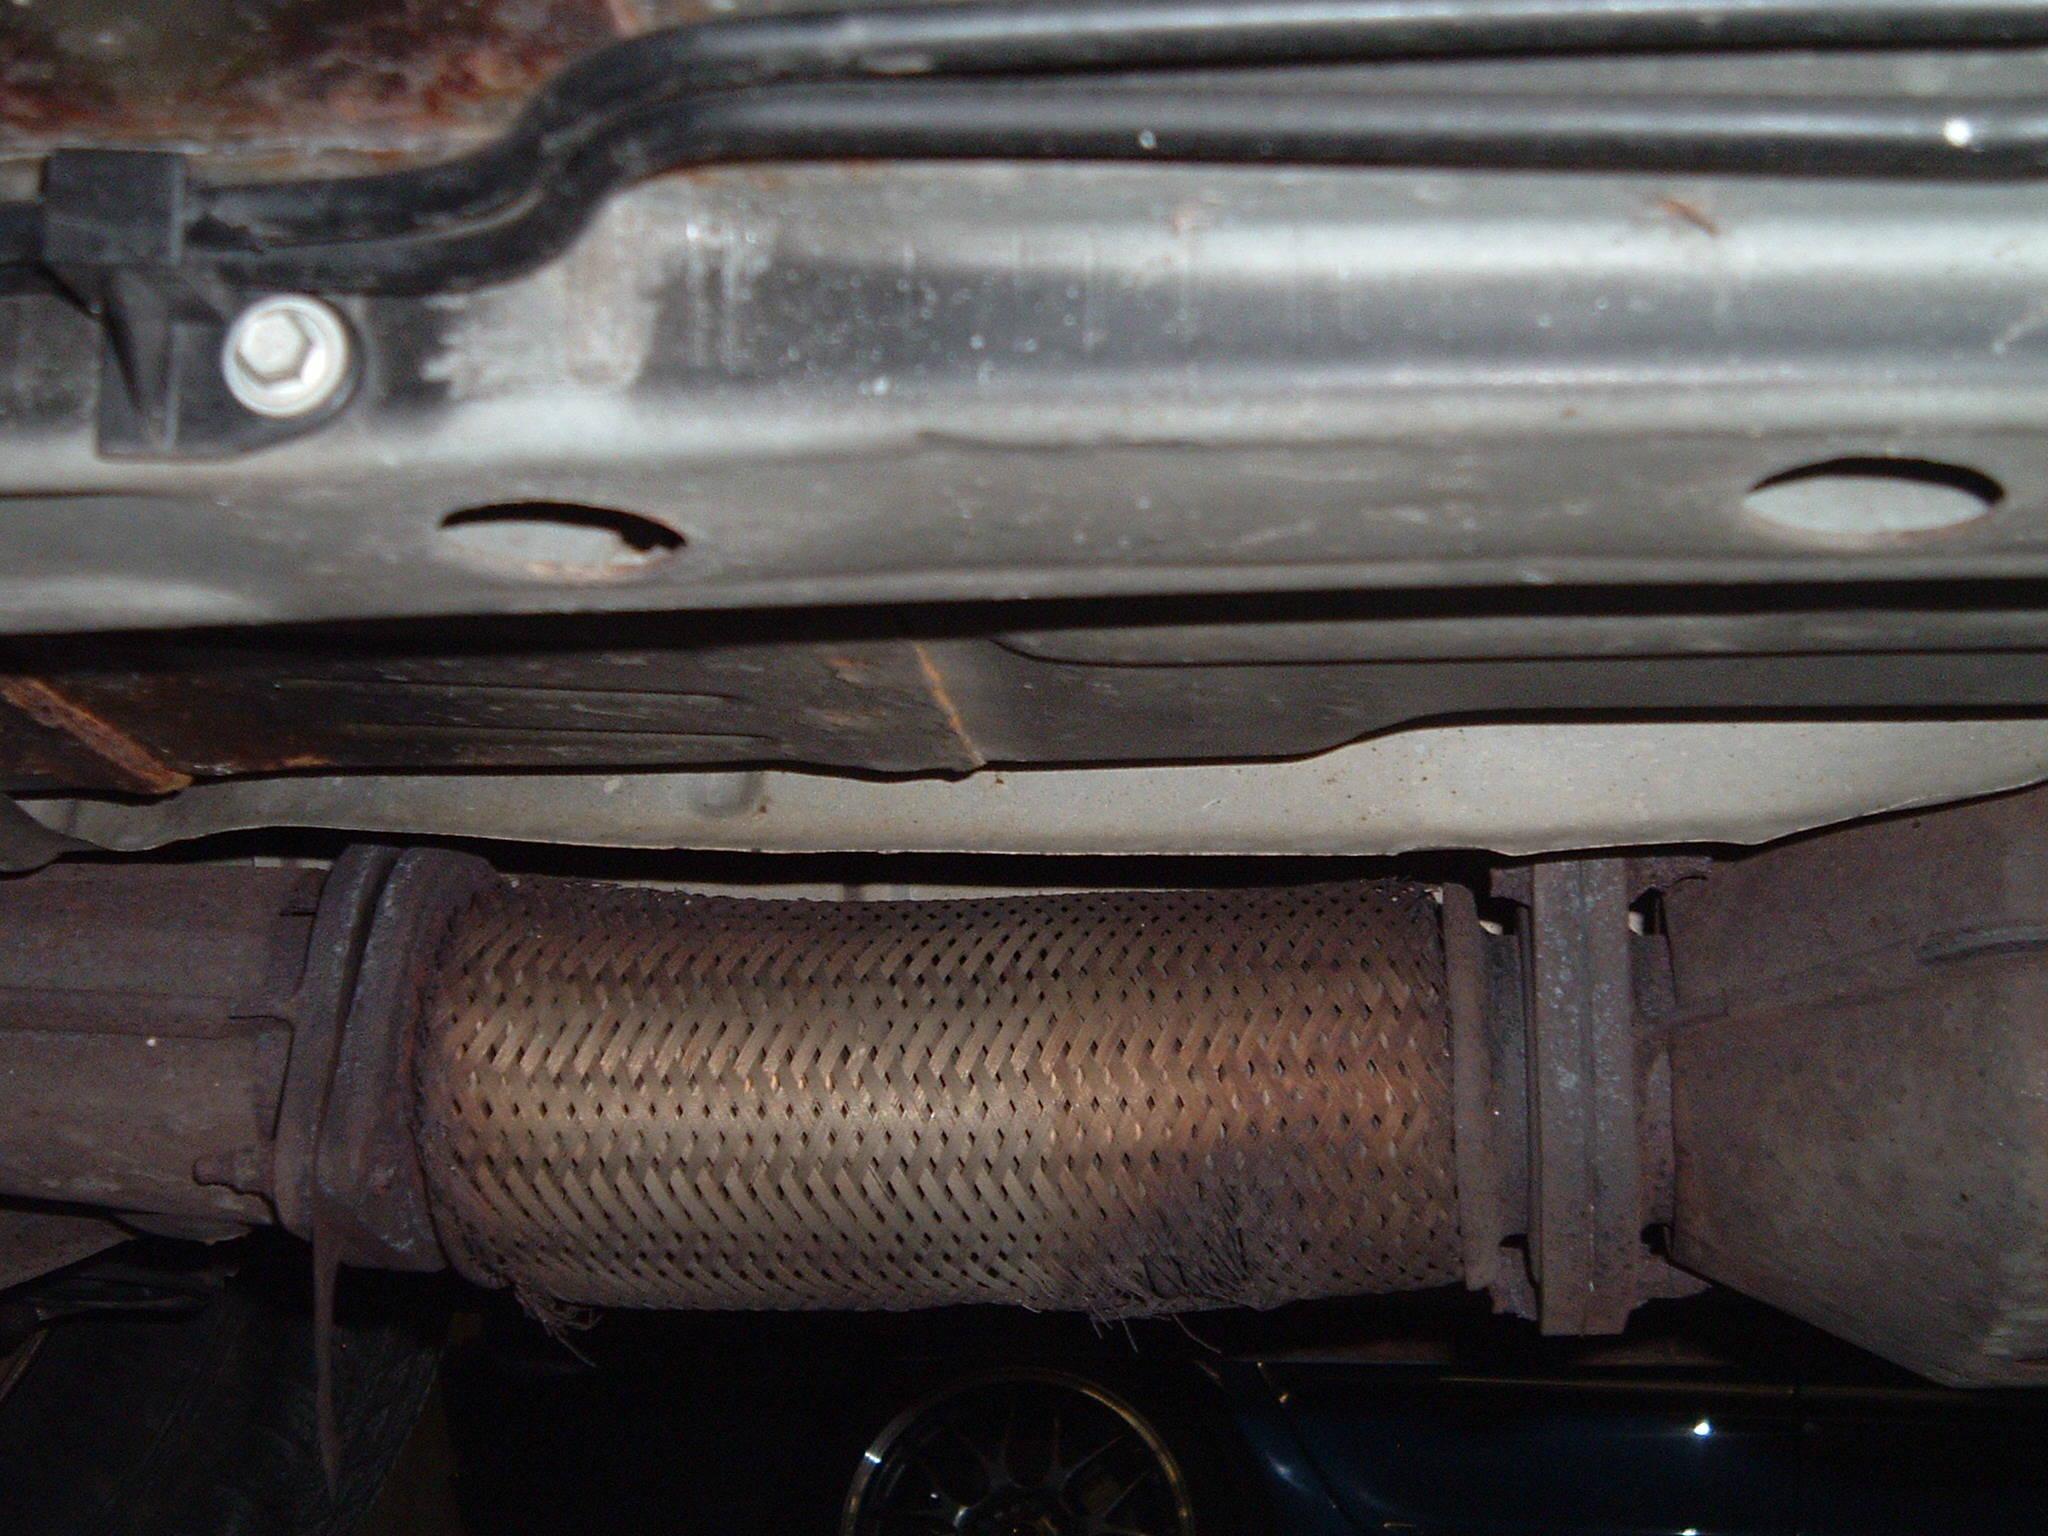 JPG (350.9 KB 1665 views) & Exhaust/flex Pipe/gasket Problem - Taurus Car Club of America : Ford ...